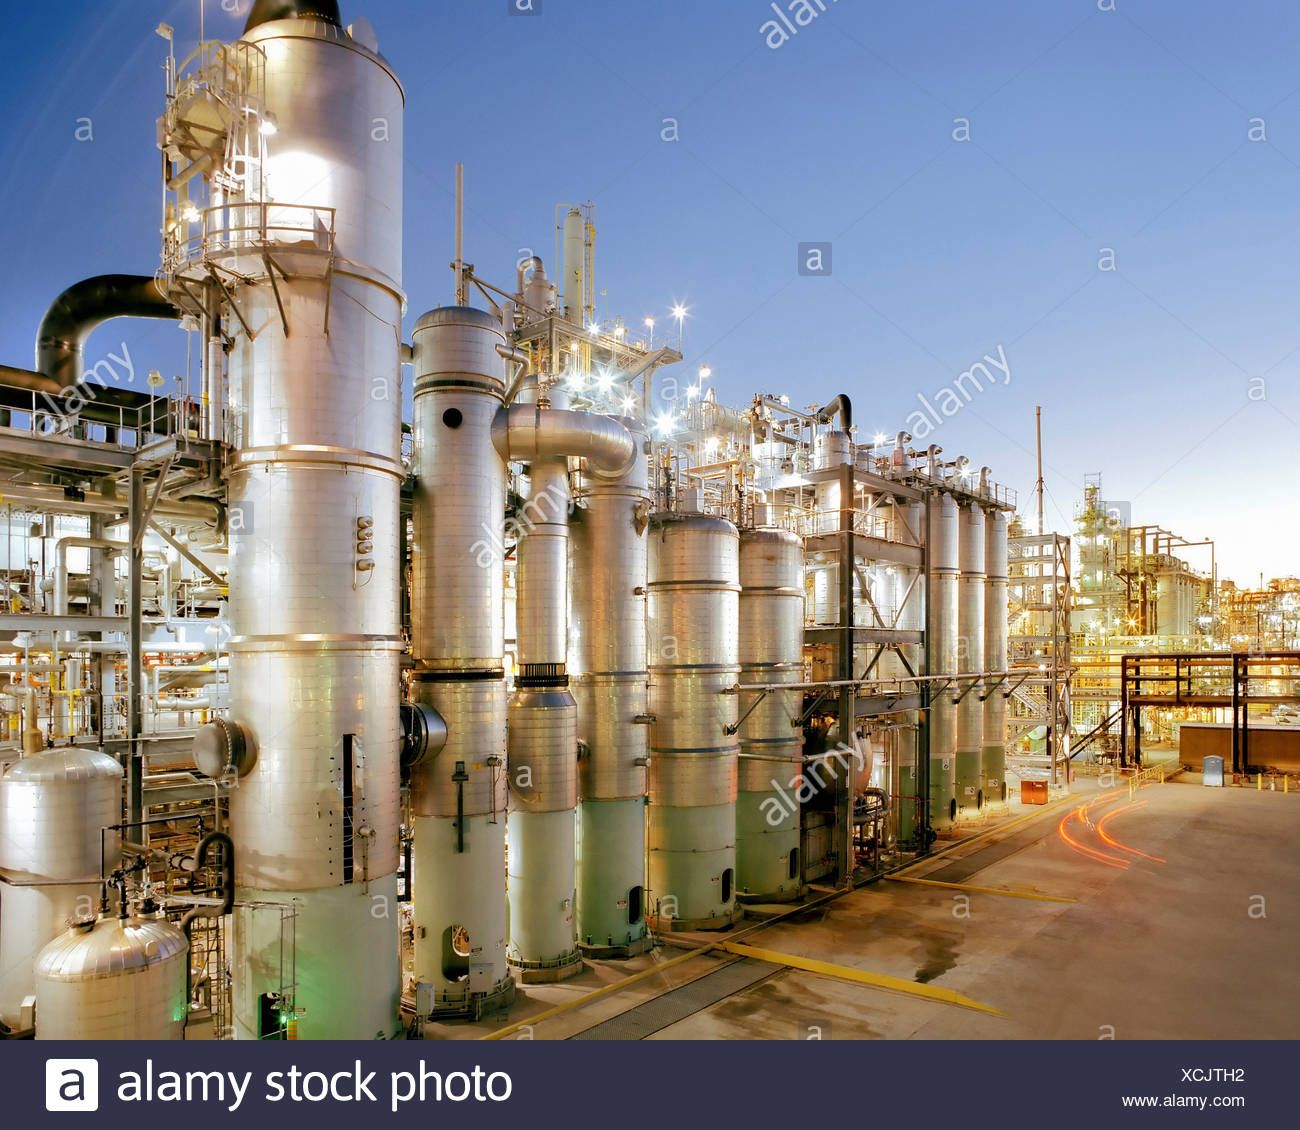 A Large Bayer Chemical Facility at Baytown, Texas Stock